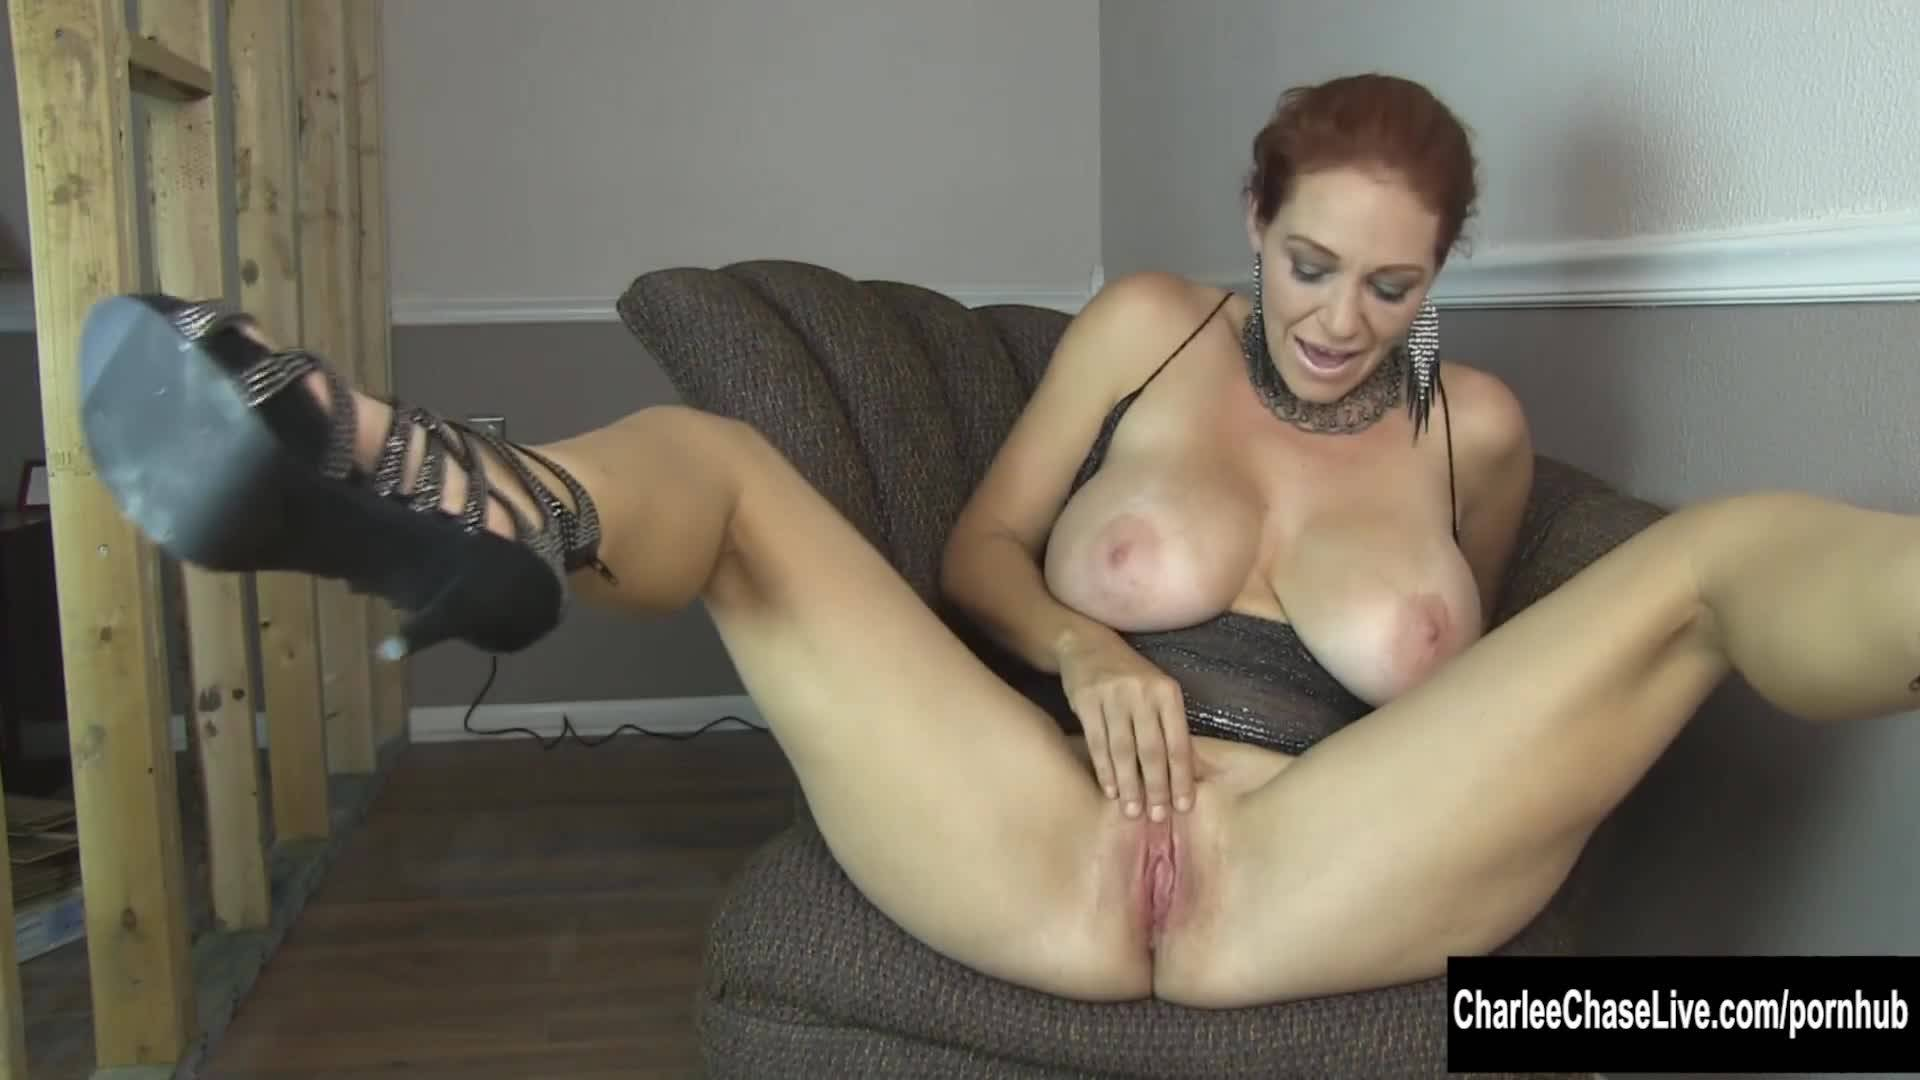 Зрелая путана мастурбирует перед камерой